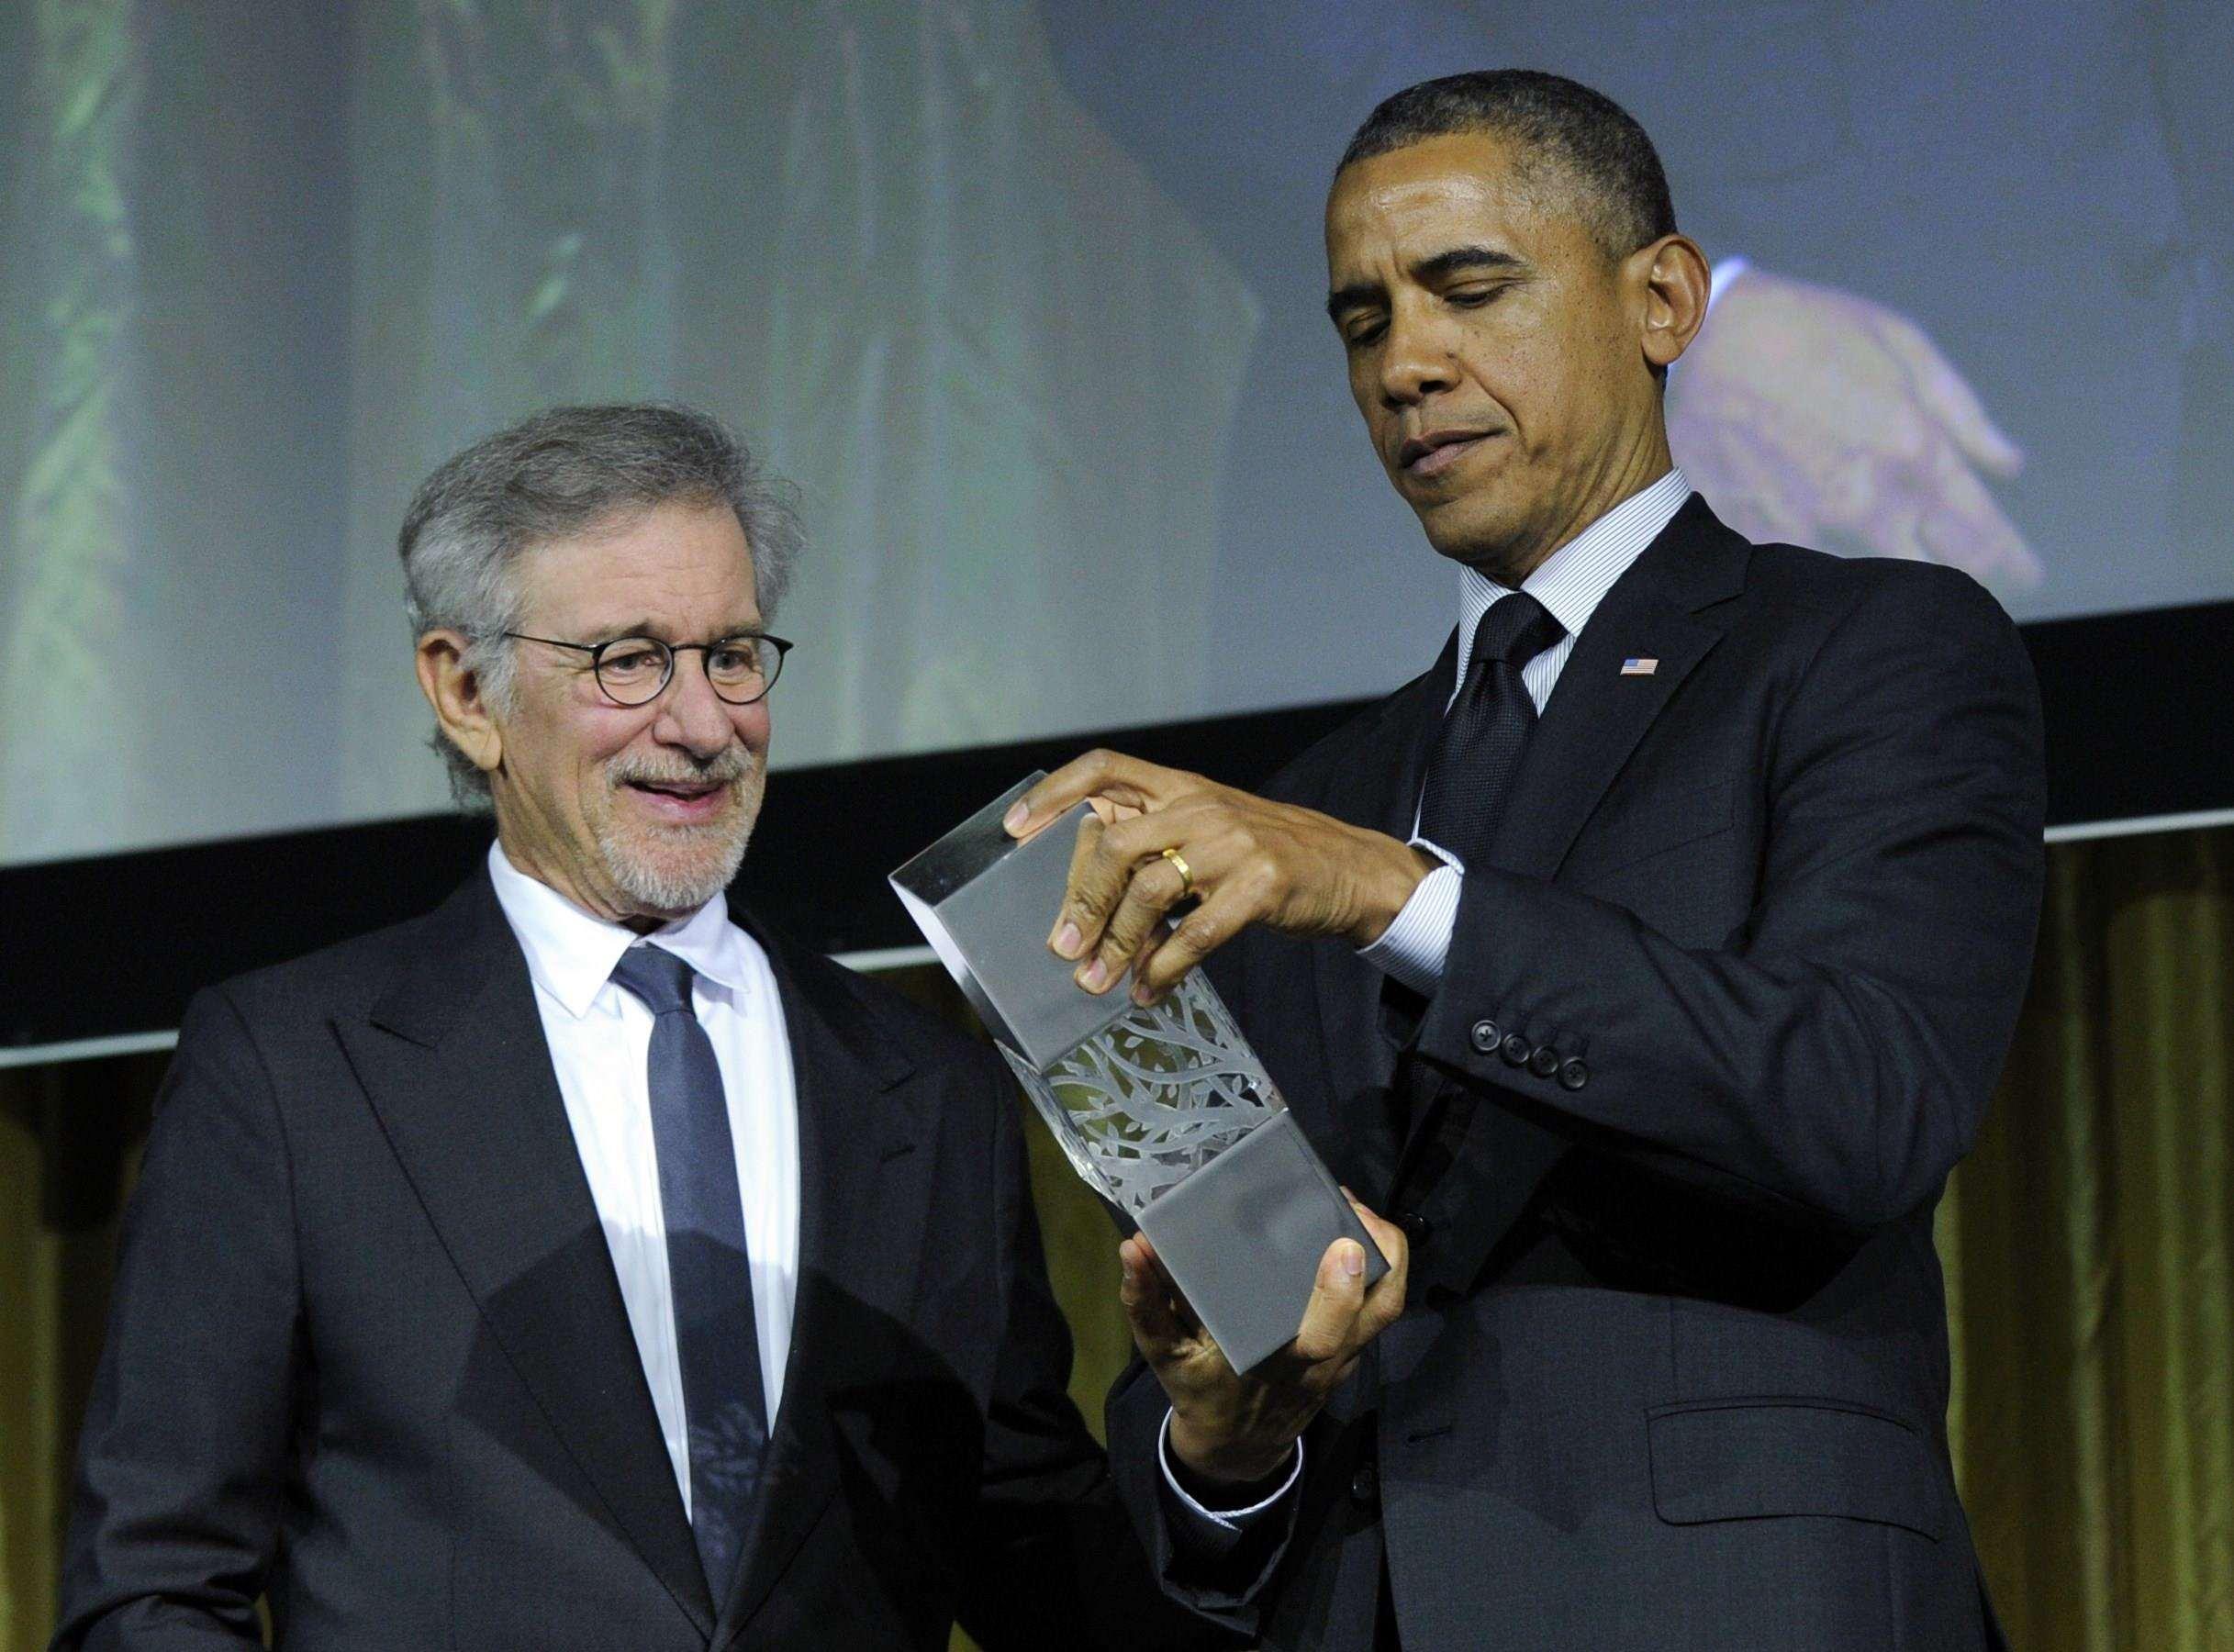 Blue State Blues: Spielberg Should Revoke Obama's Holocaust Award